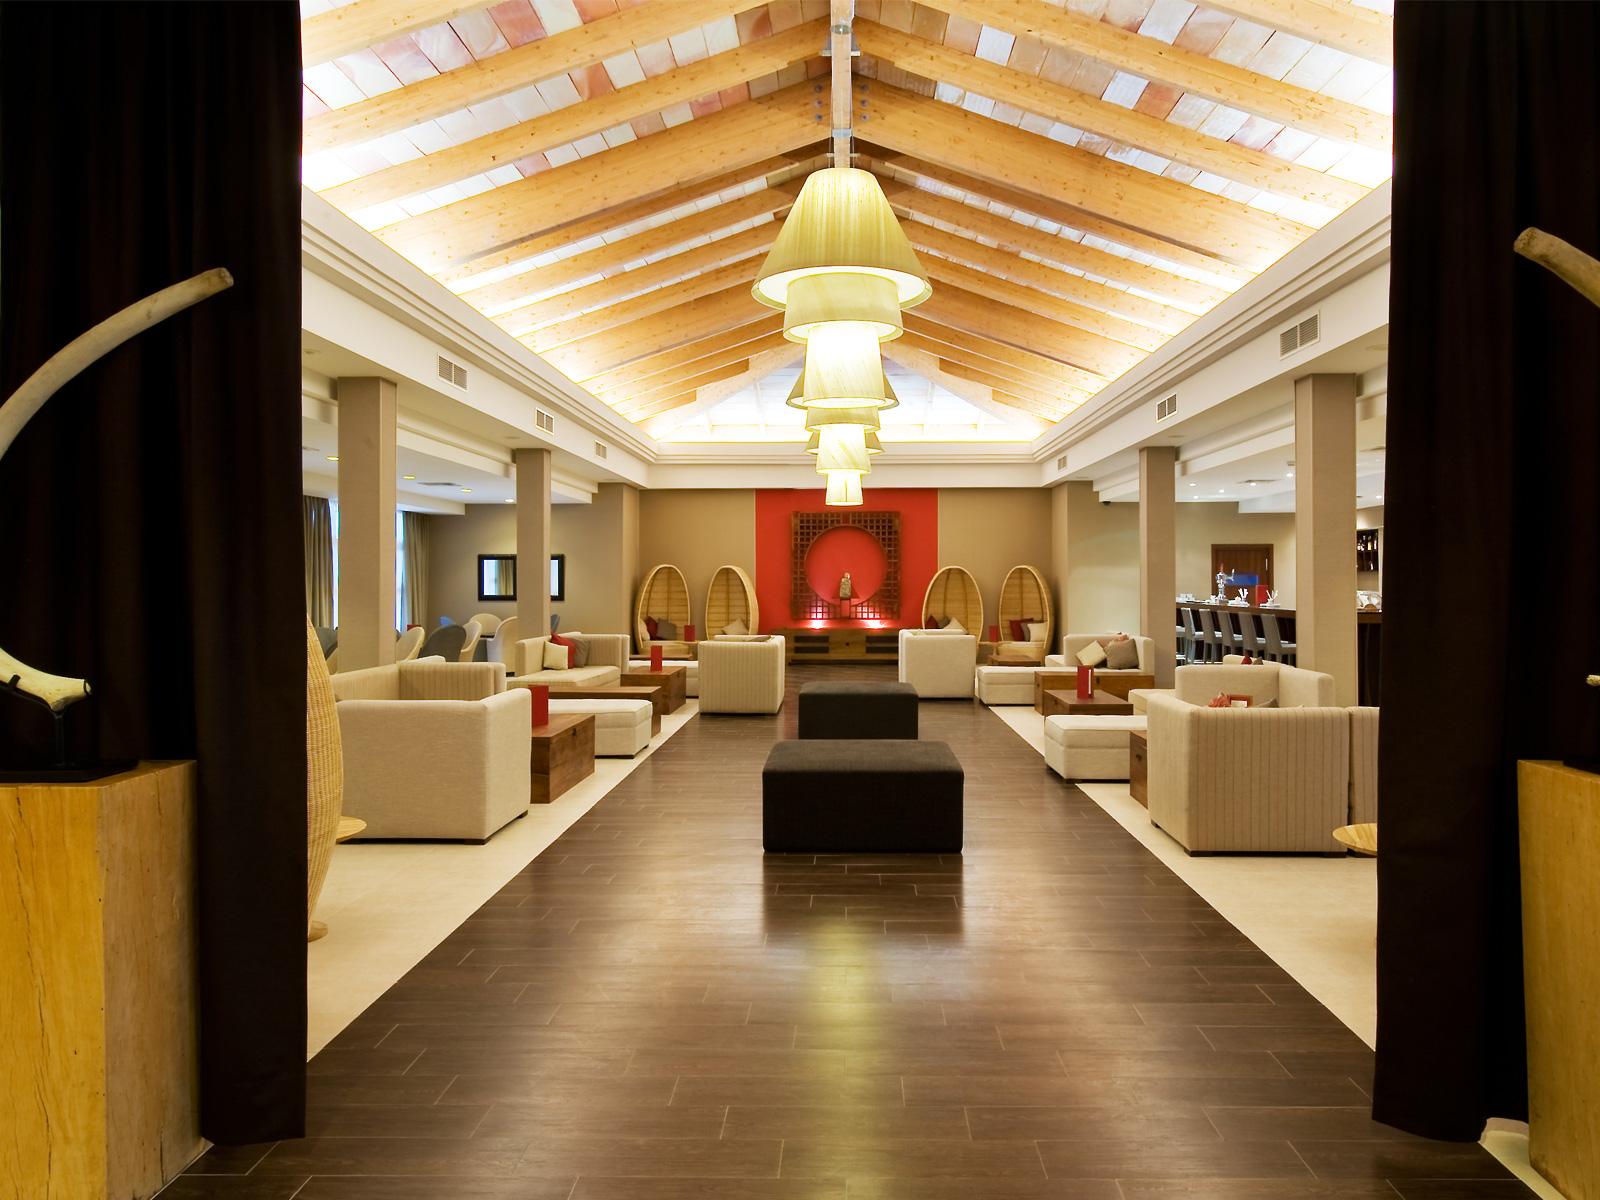 Interiore-Hoteles Vincci. Hotel Vincci Costa Golf Cadice